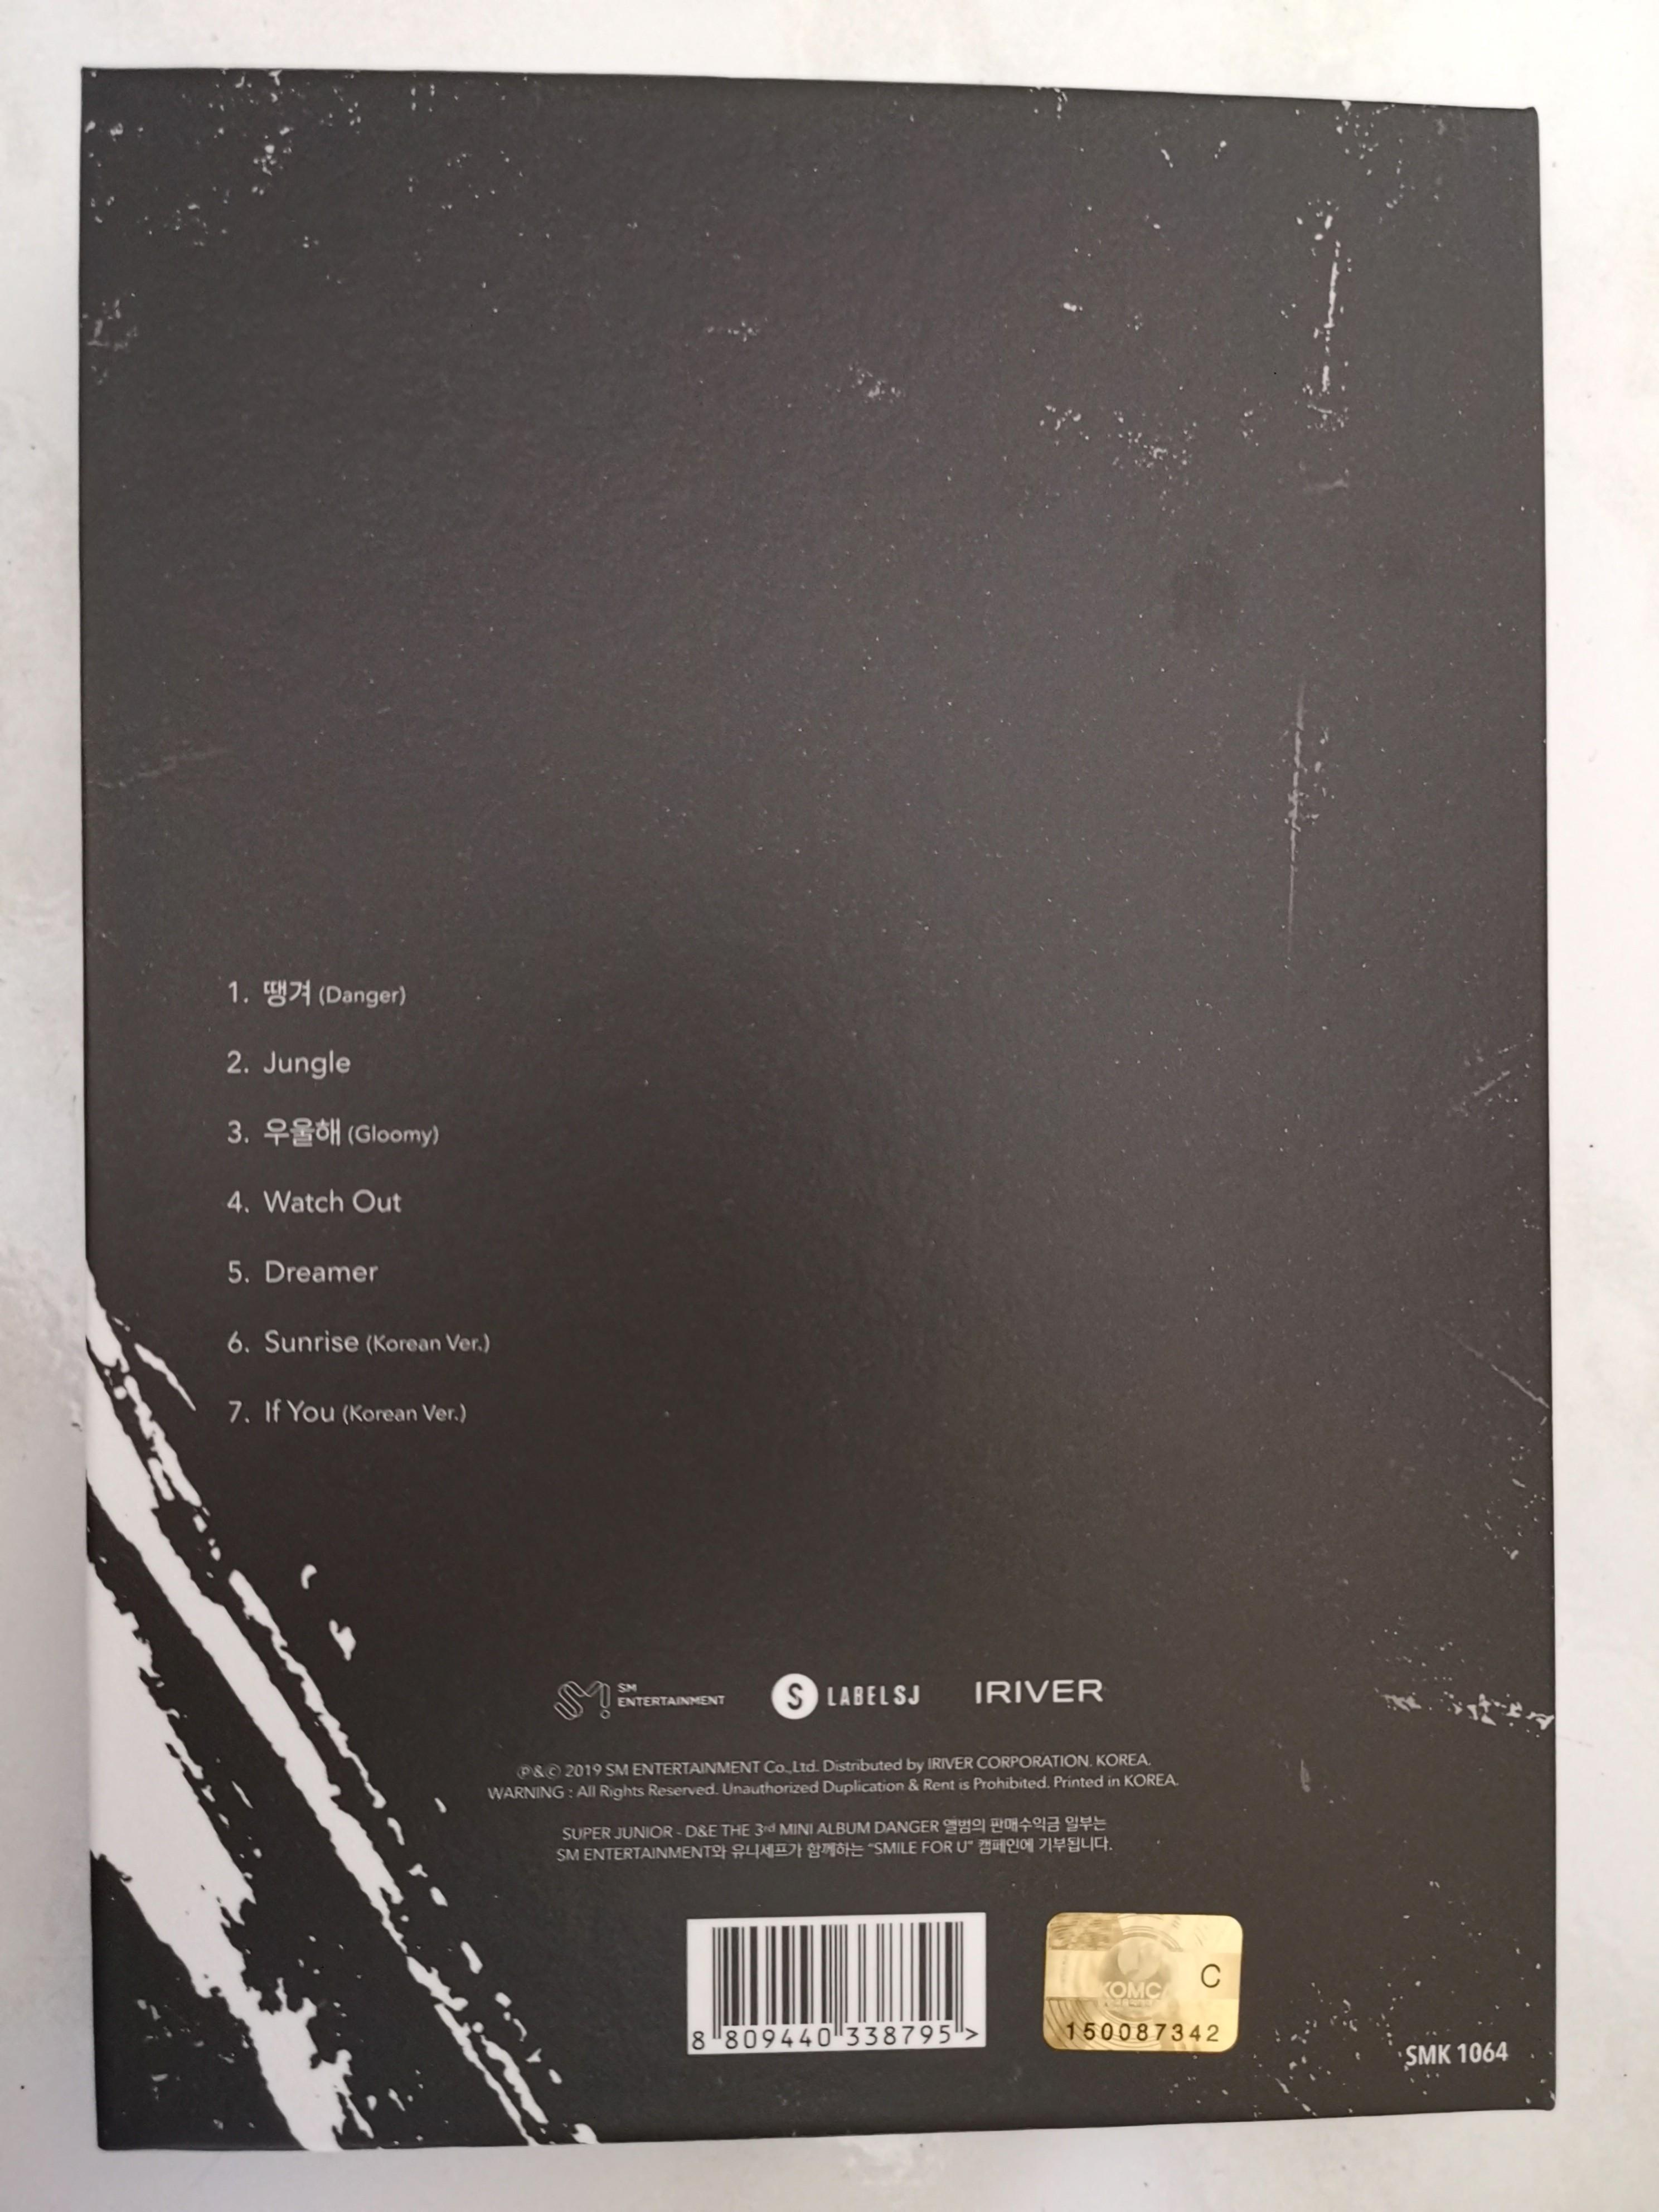 SUPER JUNIOR D&E DANGER ALBUM (BLACK VERSION) (BRAND NEW)